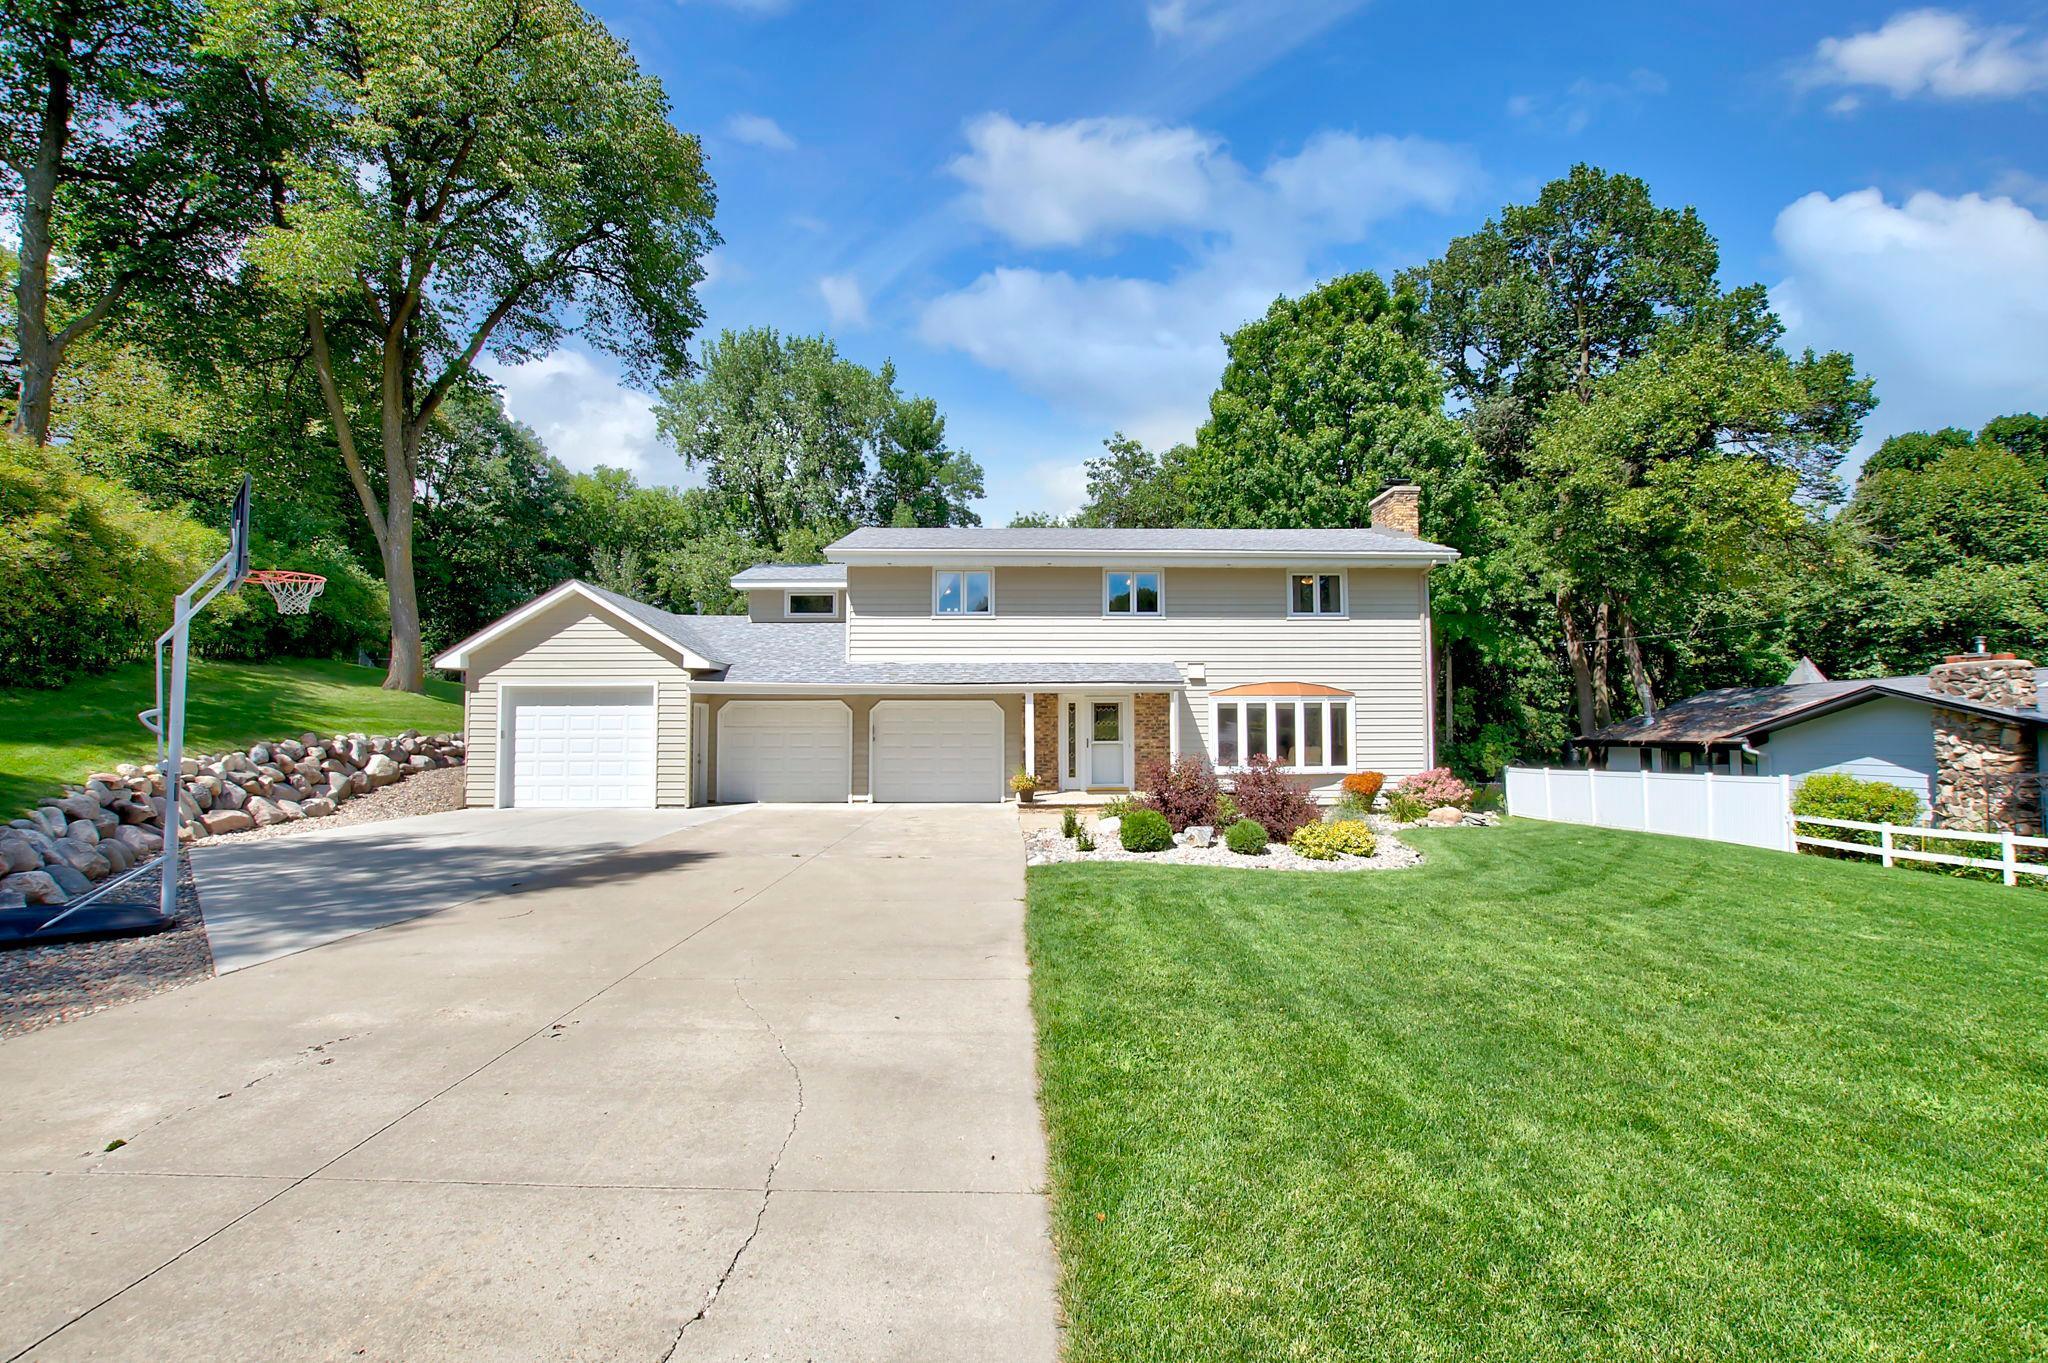 16940 N Manor Road Property Photo - Eden Prairie, MN real estate listing